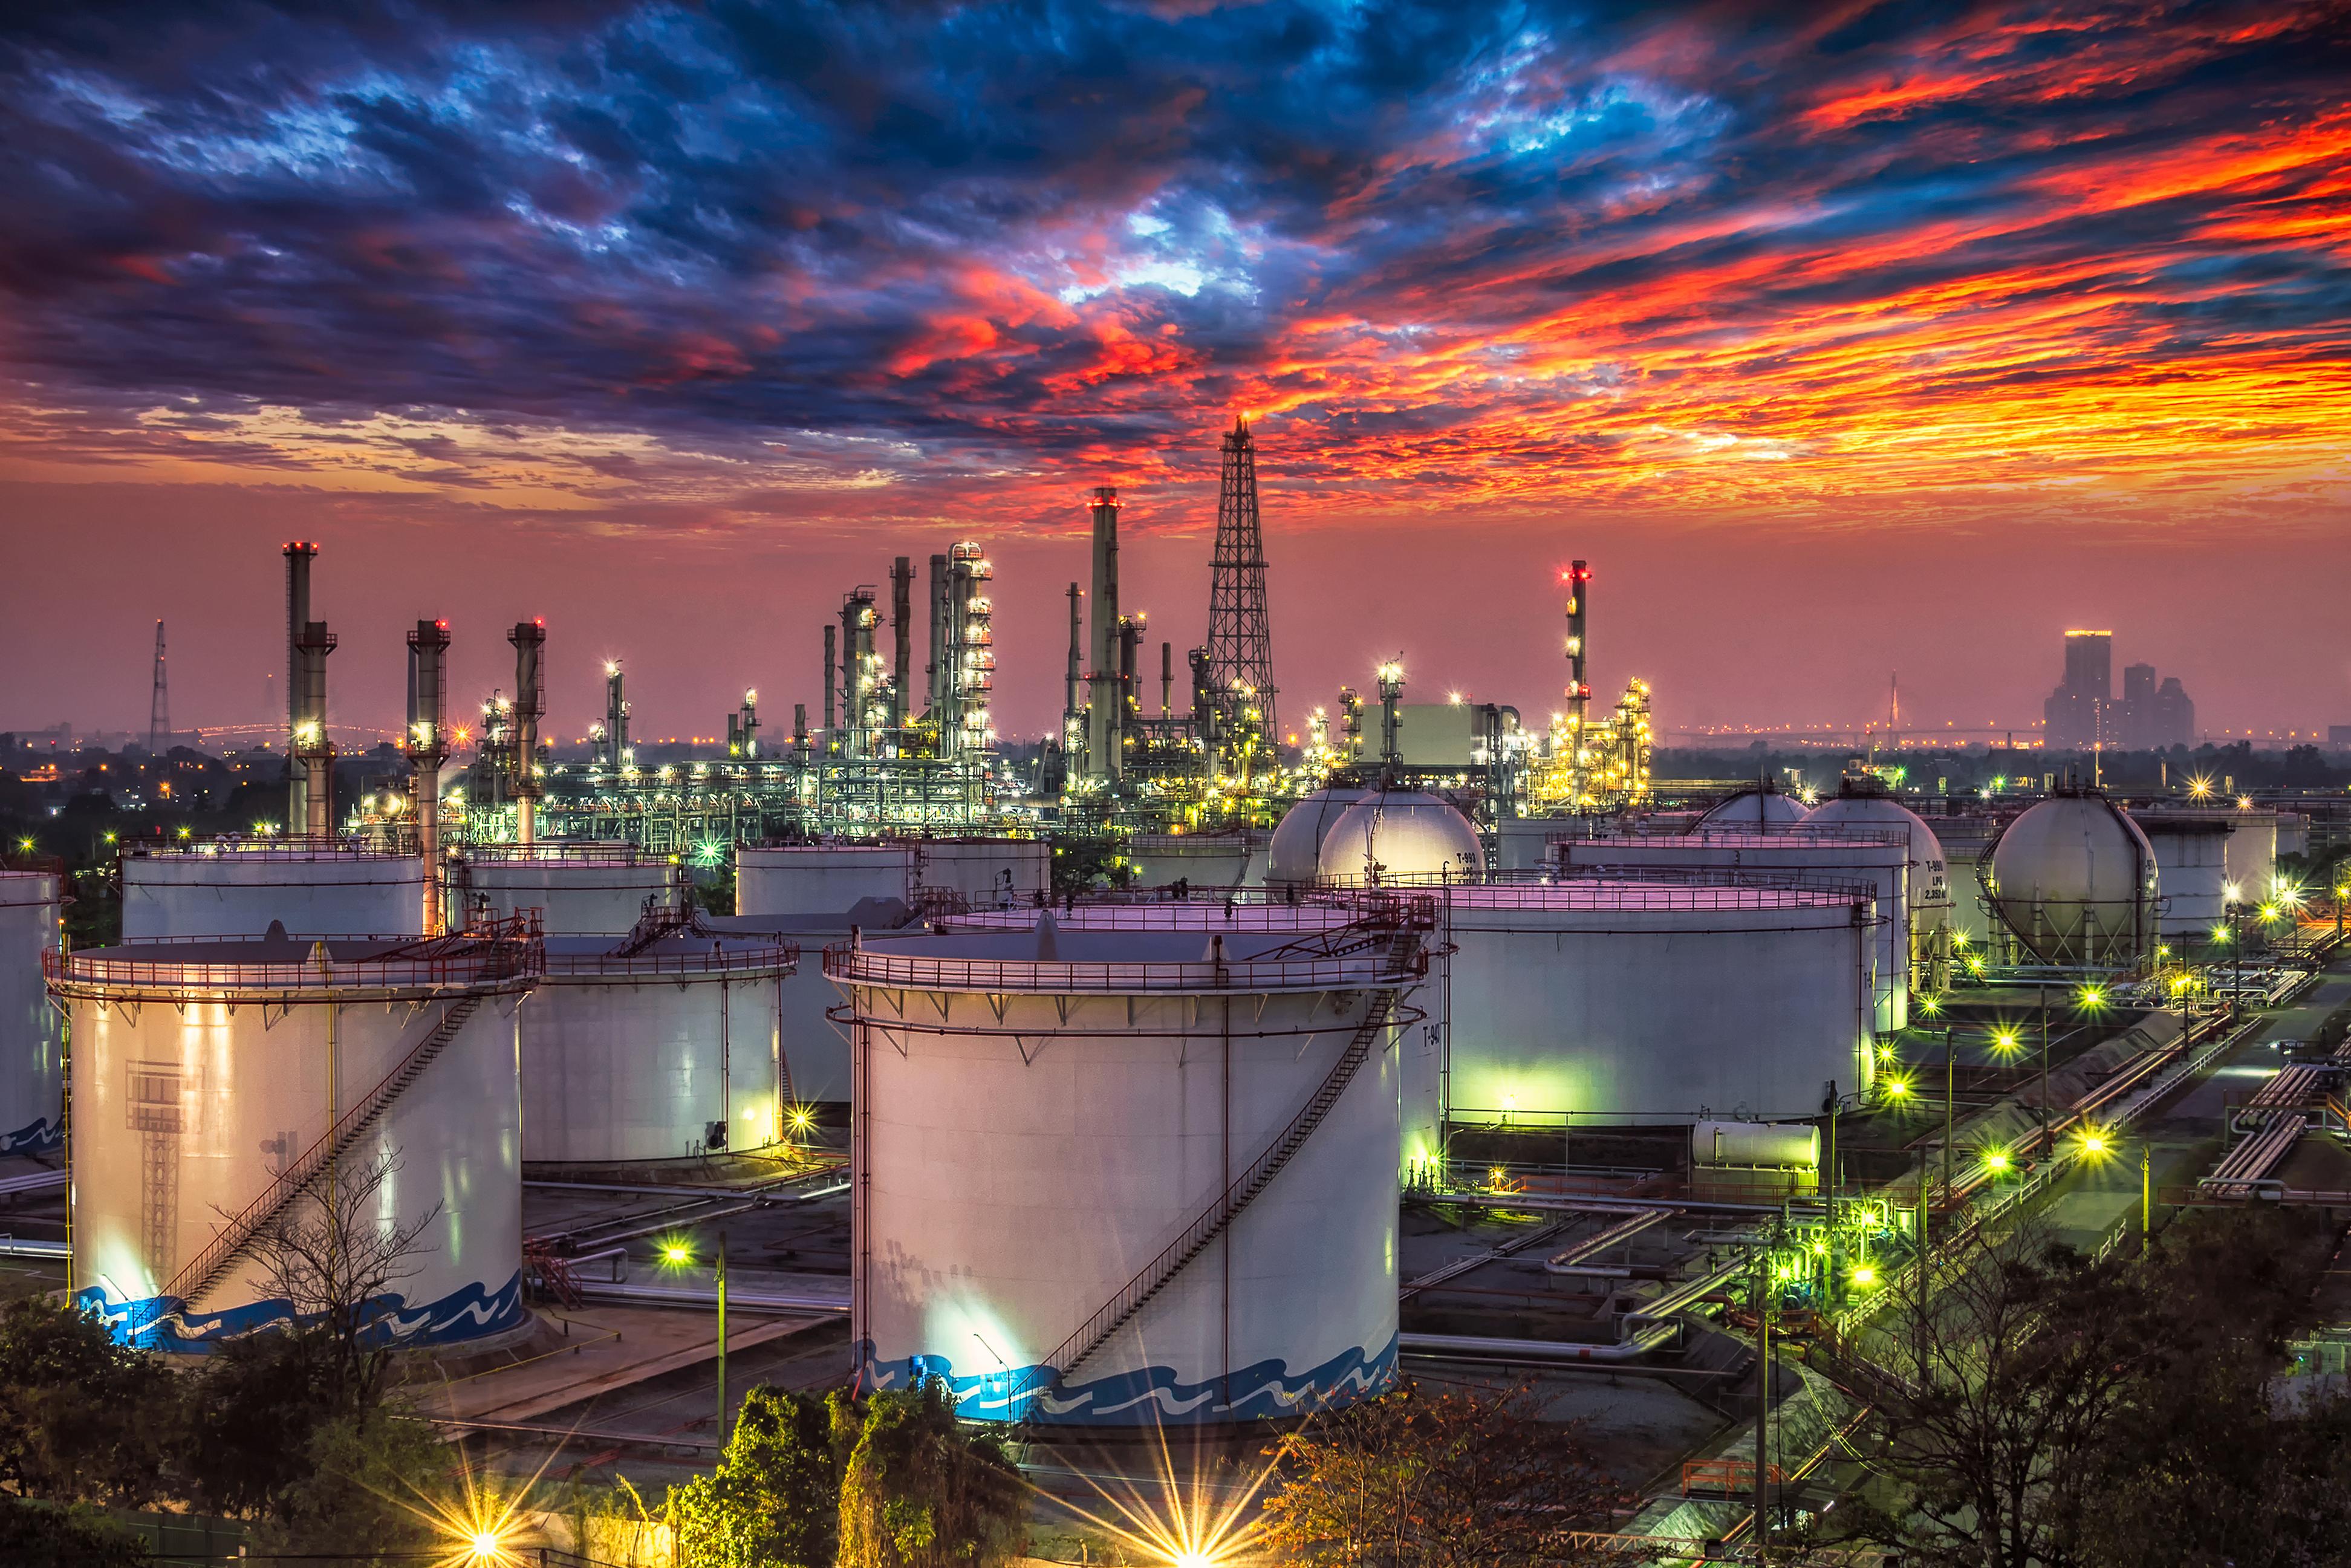 Power Plant. Shutterstock